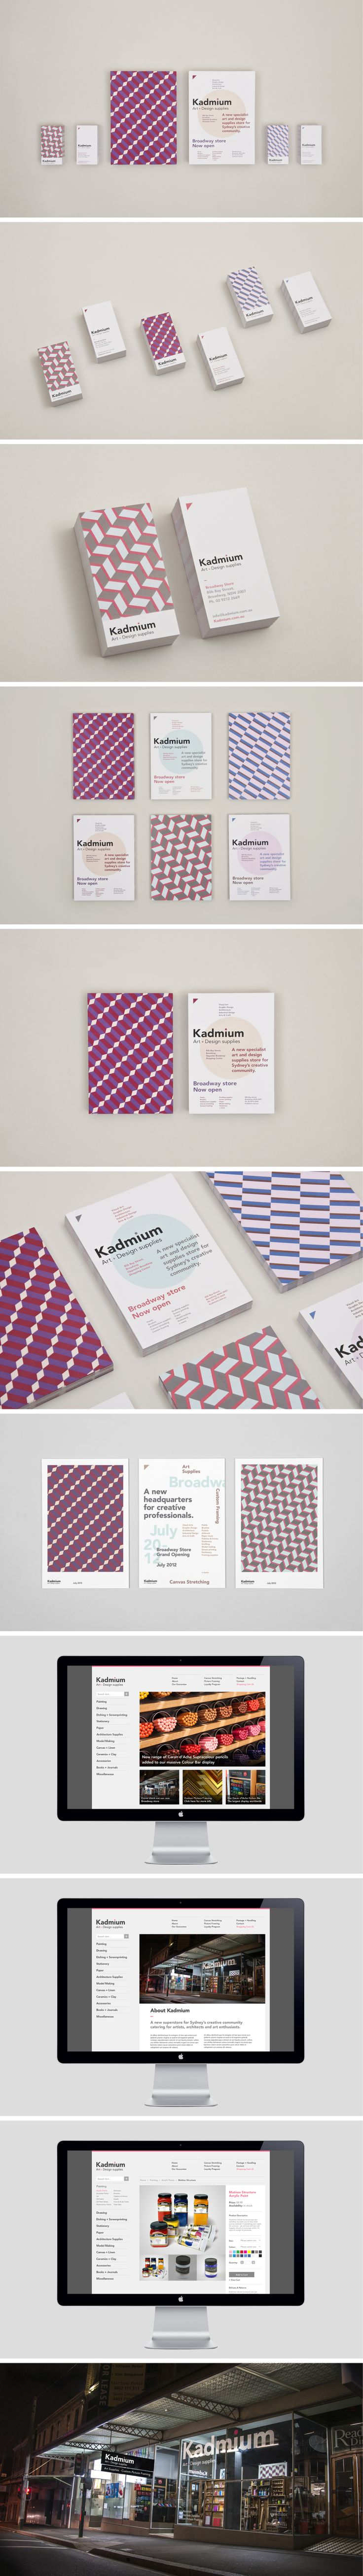 Kadmium Art And Design Supplies